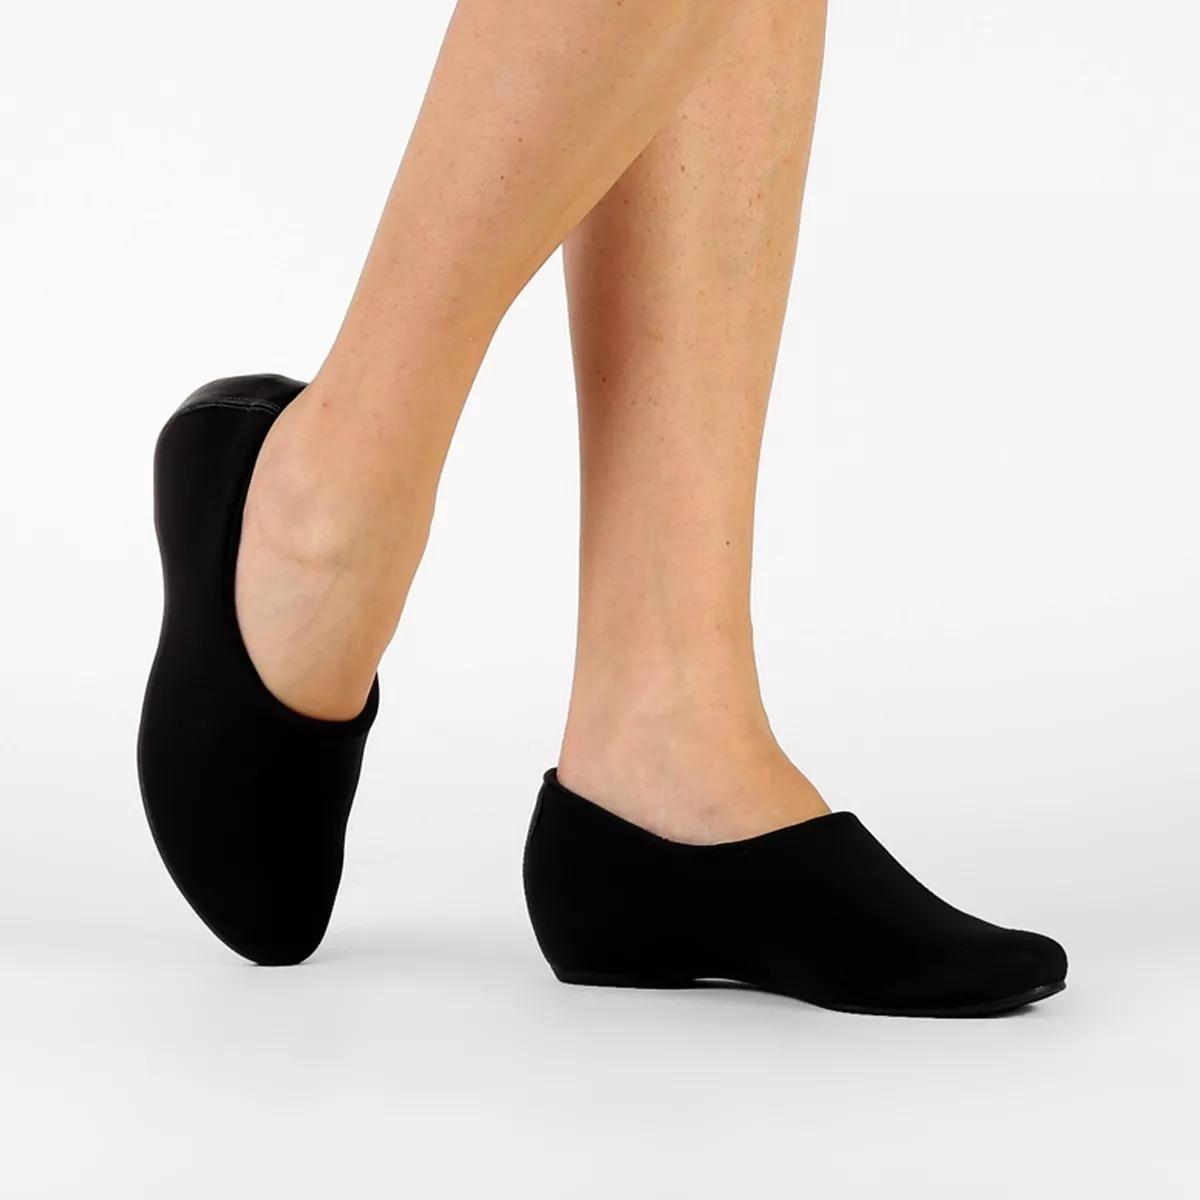 e194c8c74 Sapato Feminino Usaflex Care Diabetes N 2251 Db-50 Joante - R$ 199 ...